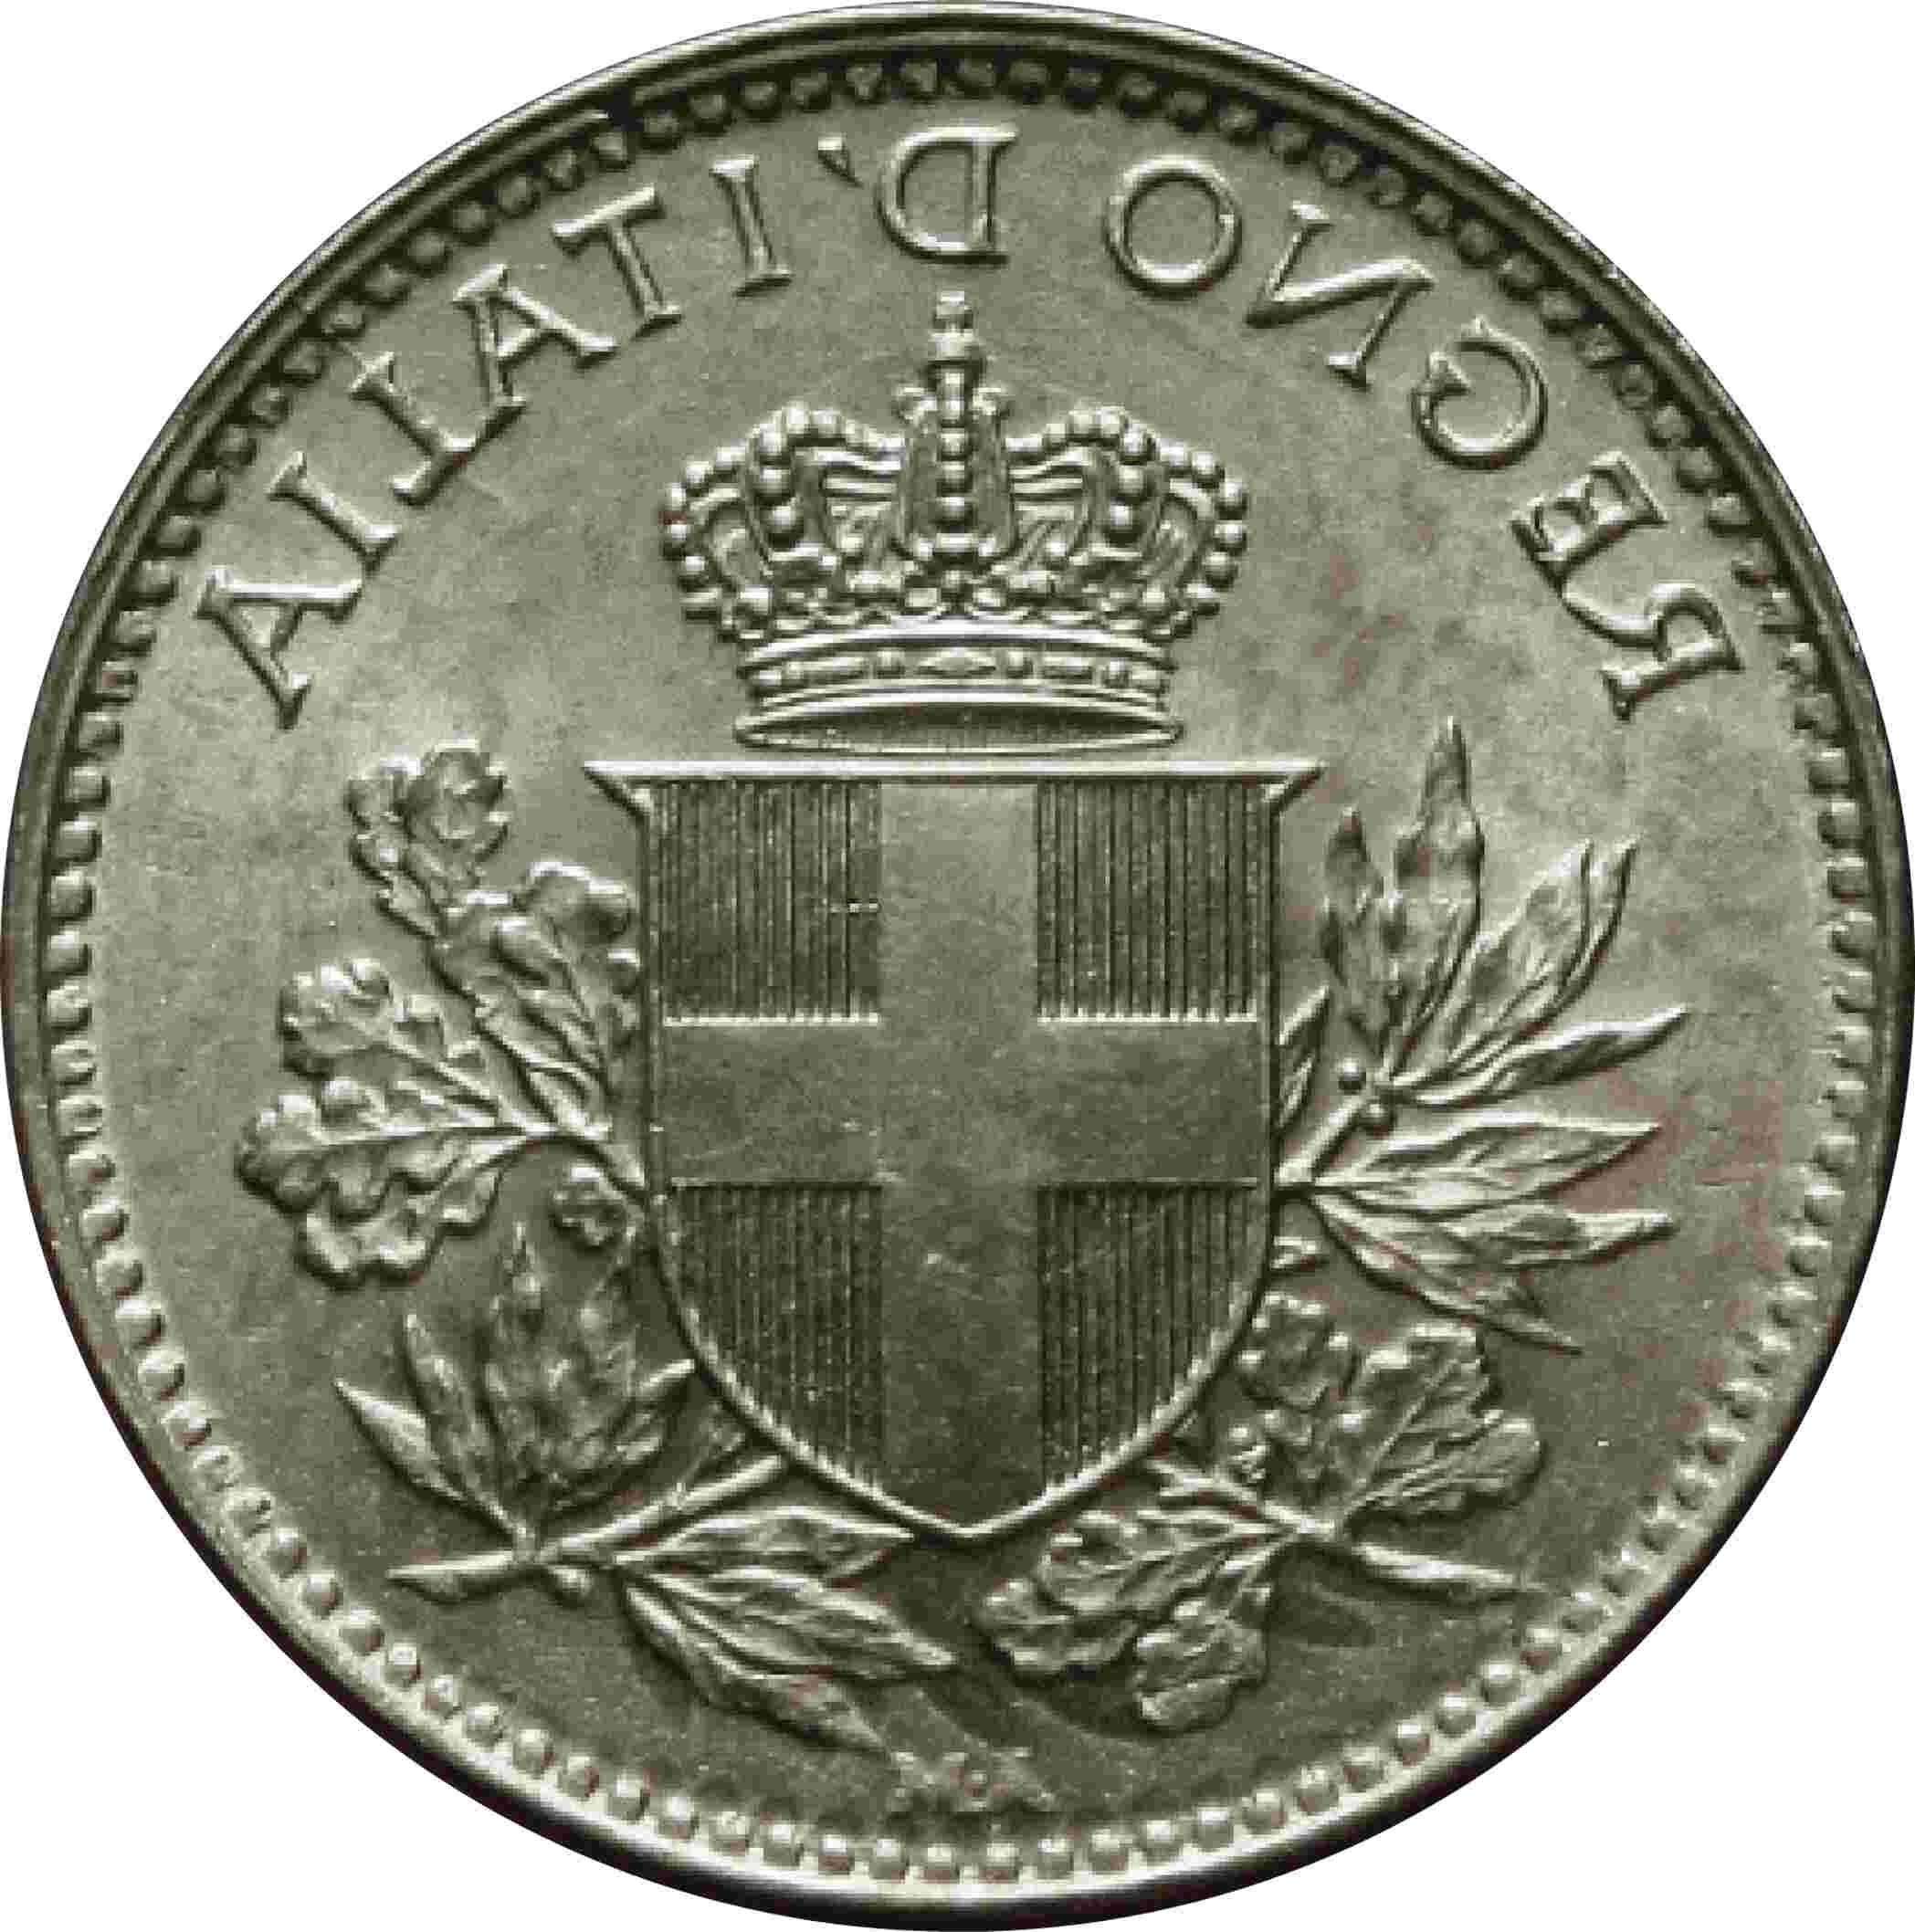 vittorio emanuele iii 20 cent usato